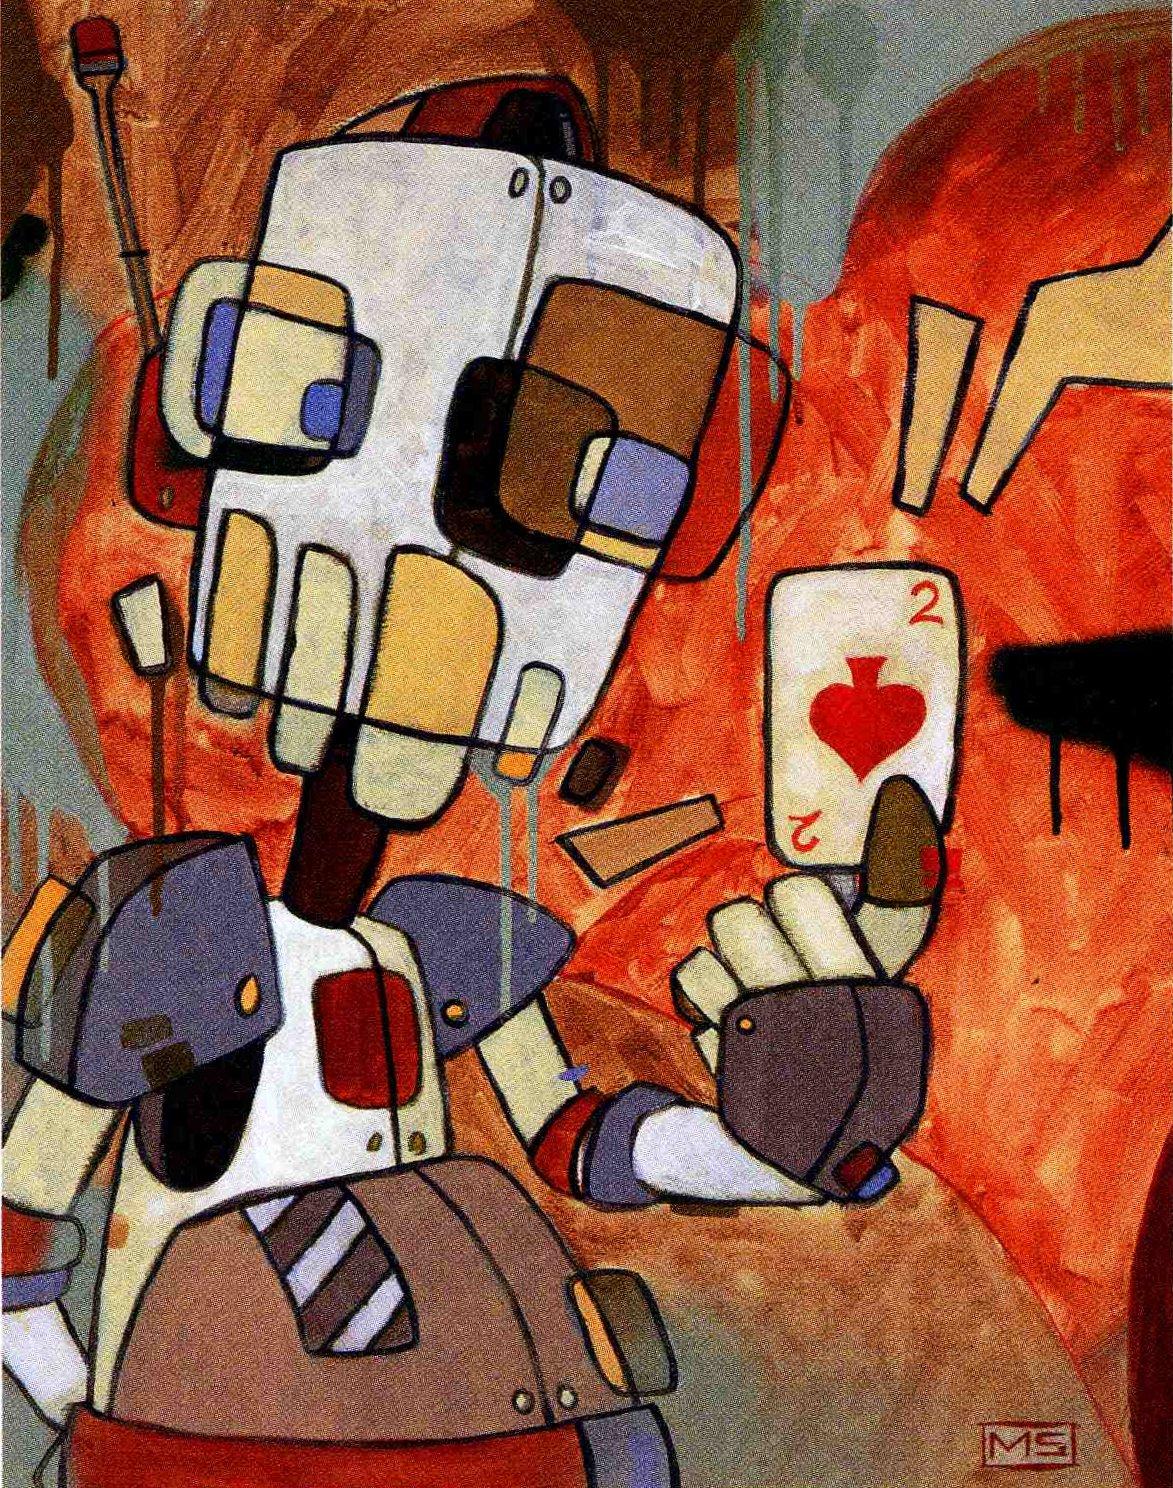 Hearts / Clubs, peinture tirée de Back de Diamonds, Spades, Hearts & Clubs' par Mike Shinoda